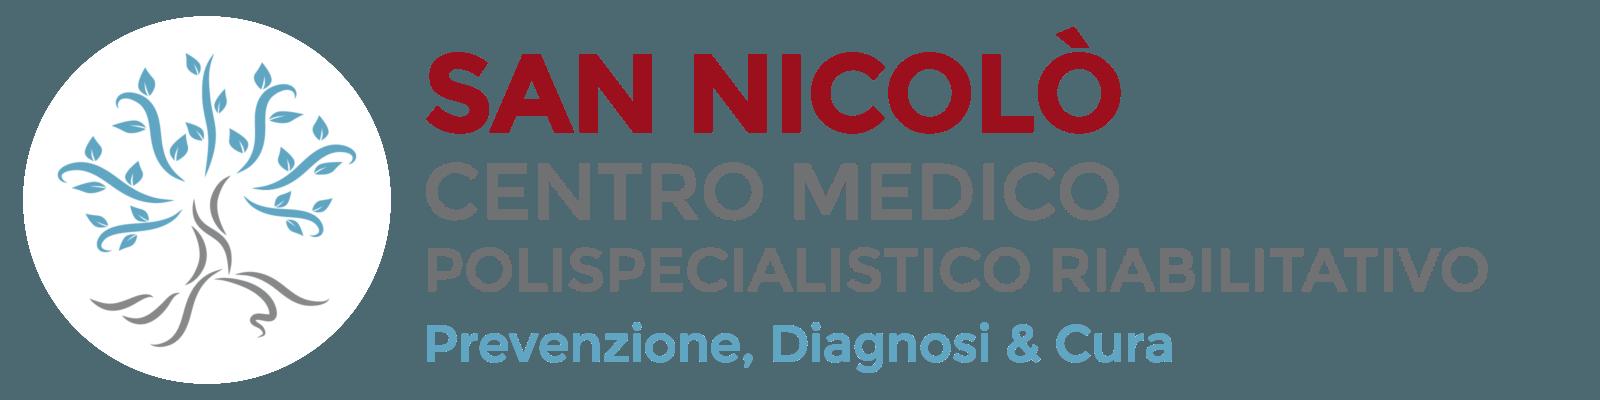 Centro Medico Polispecialistico e Riabilitativo San Nicolò